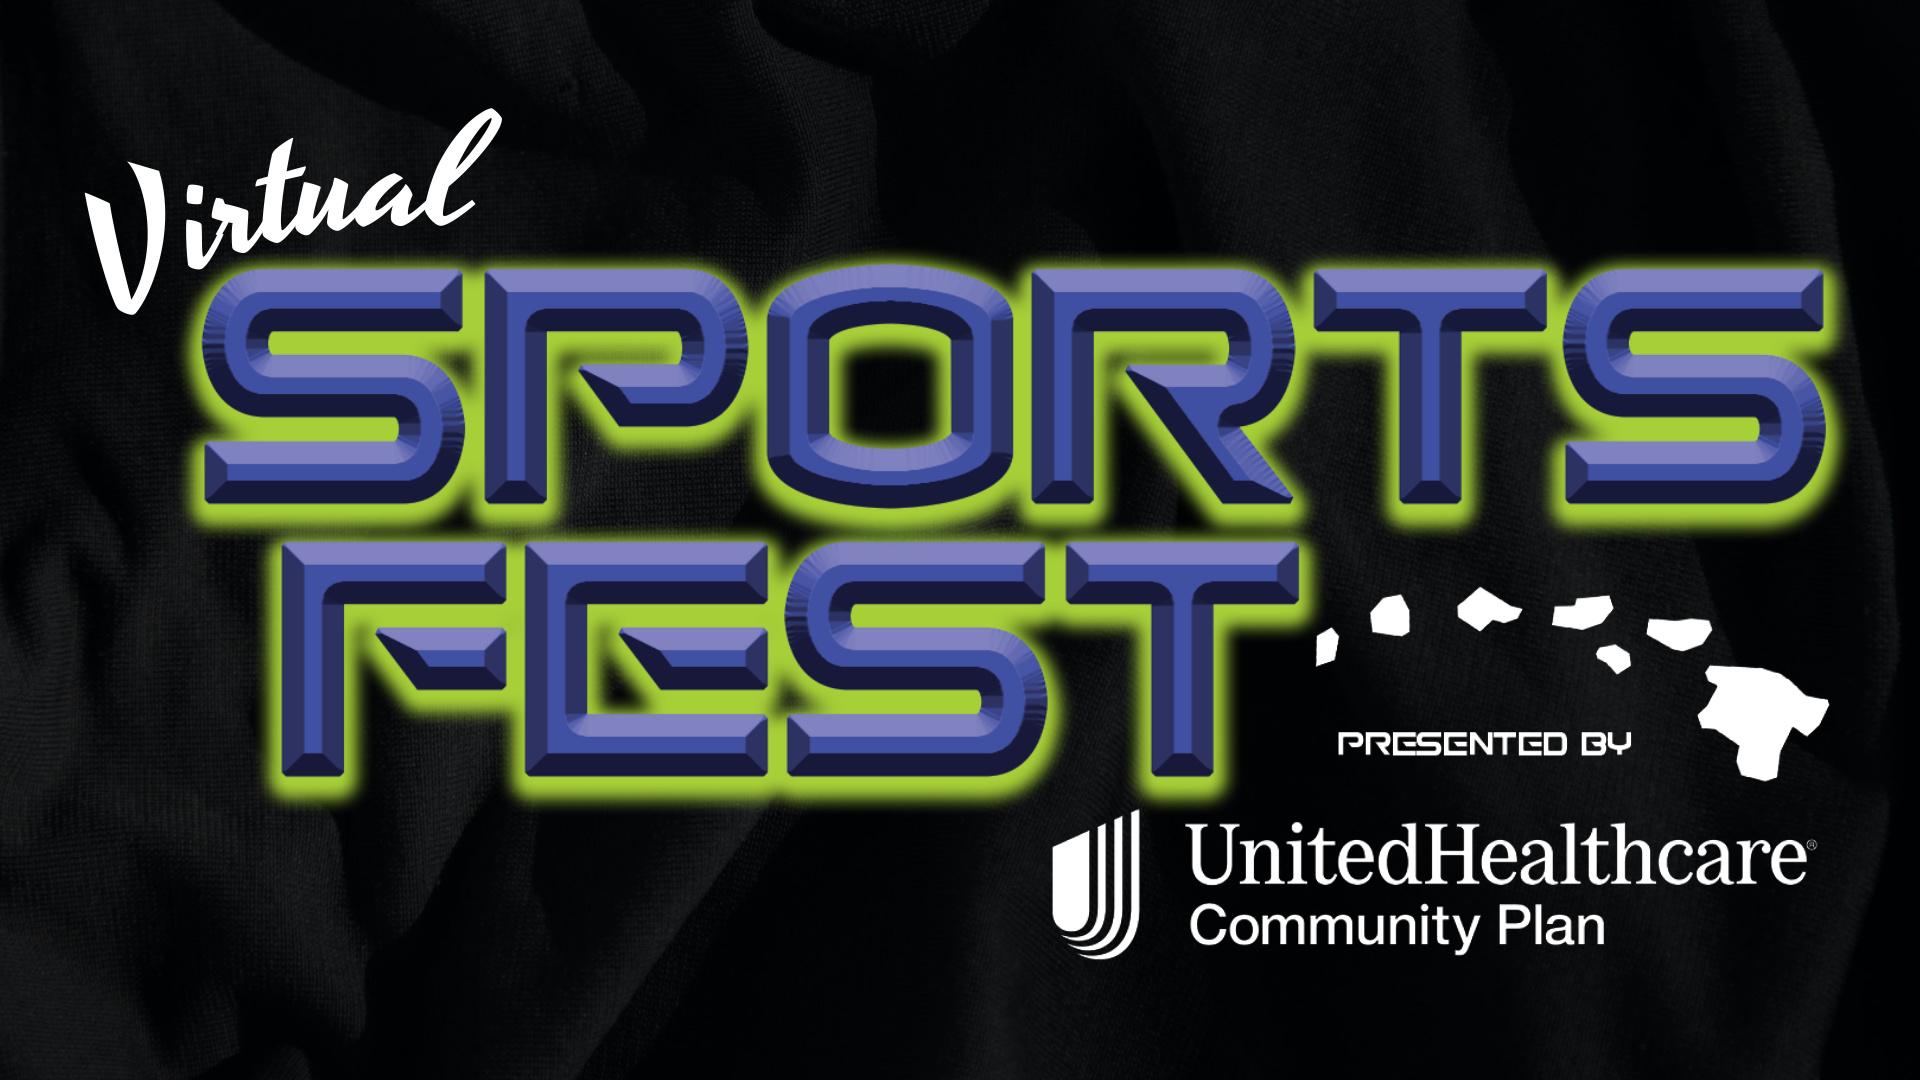 2021 Virtual Sports Fest